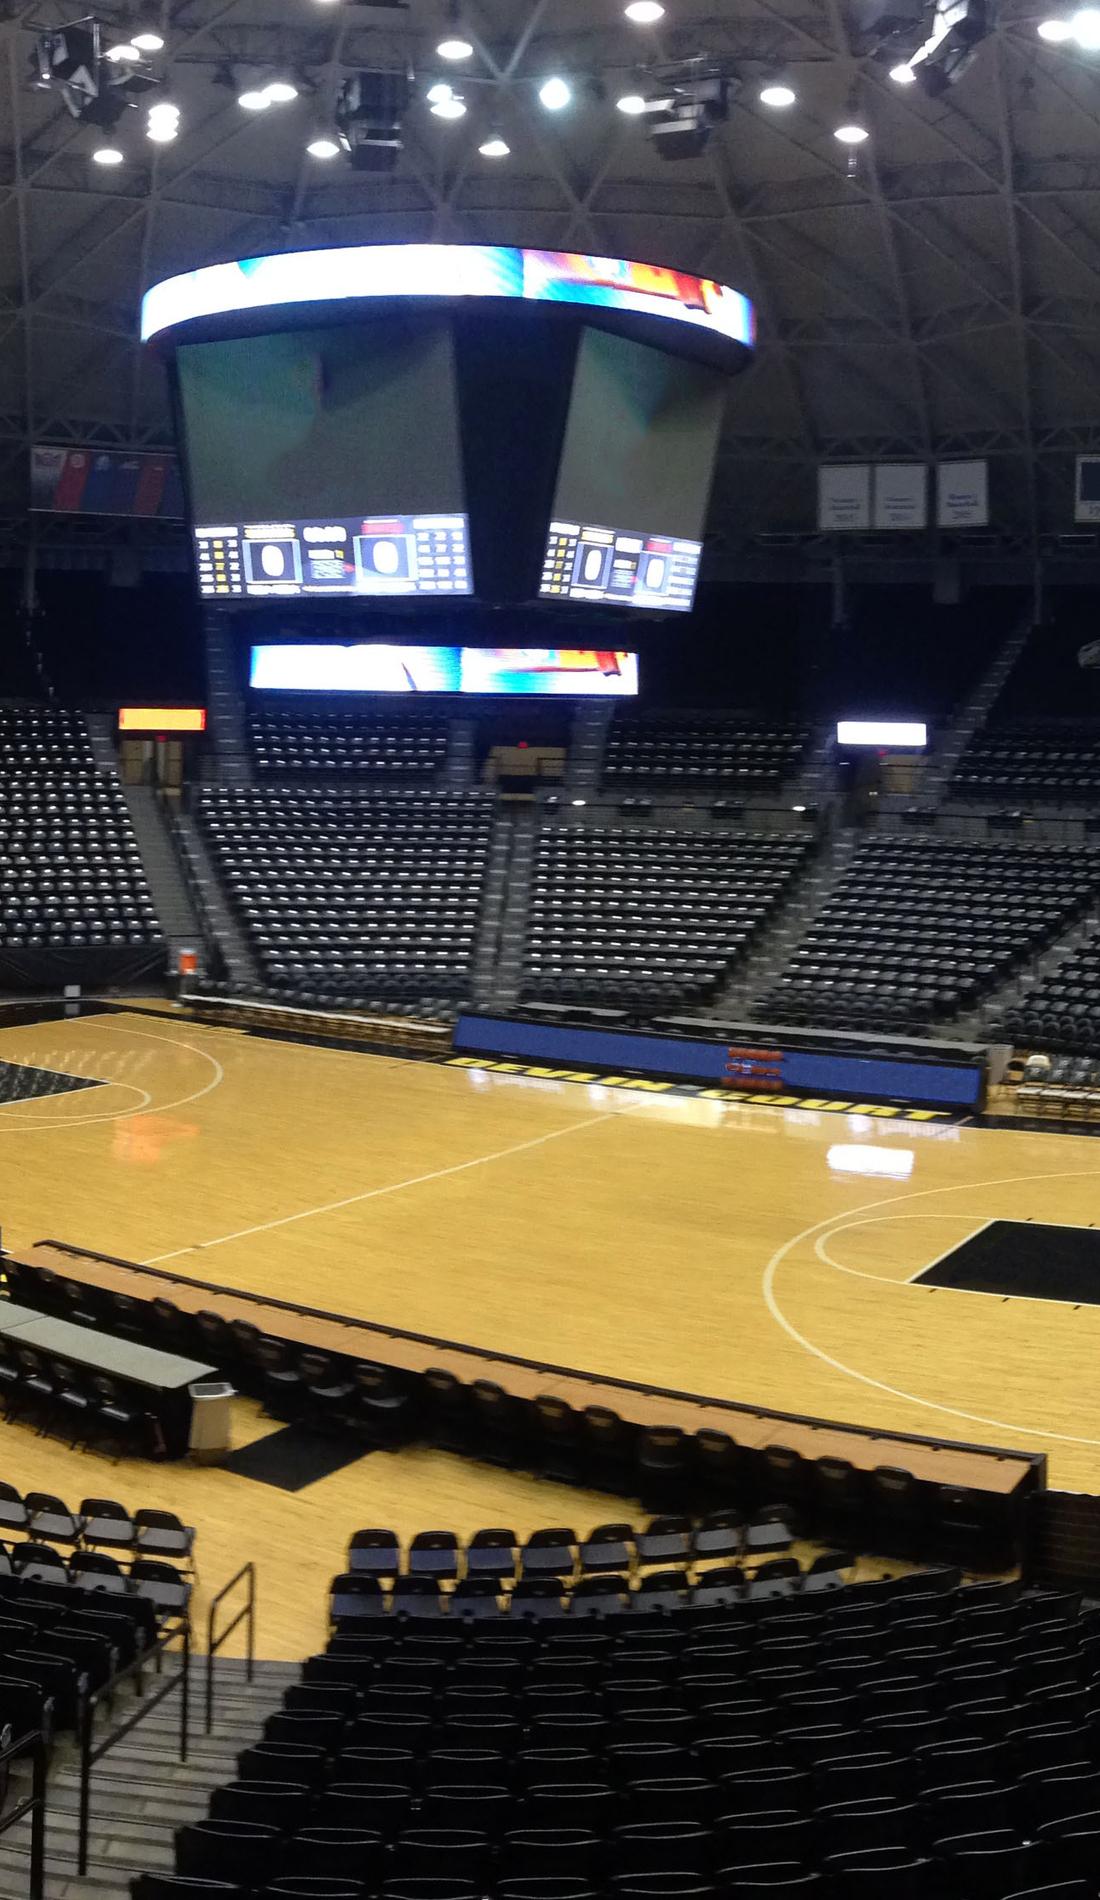 A Wichita State Shockers Basketball live event